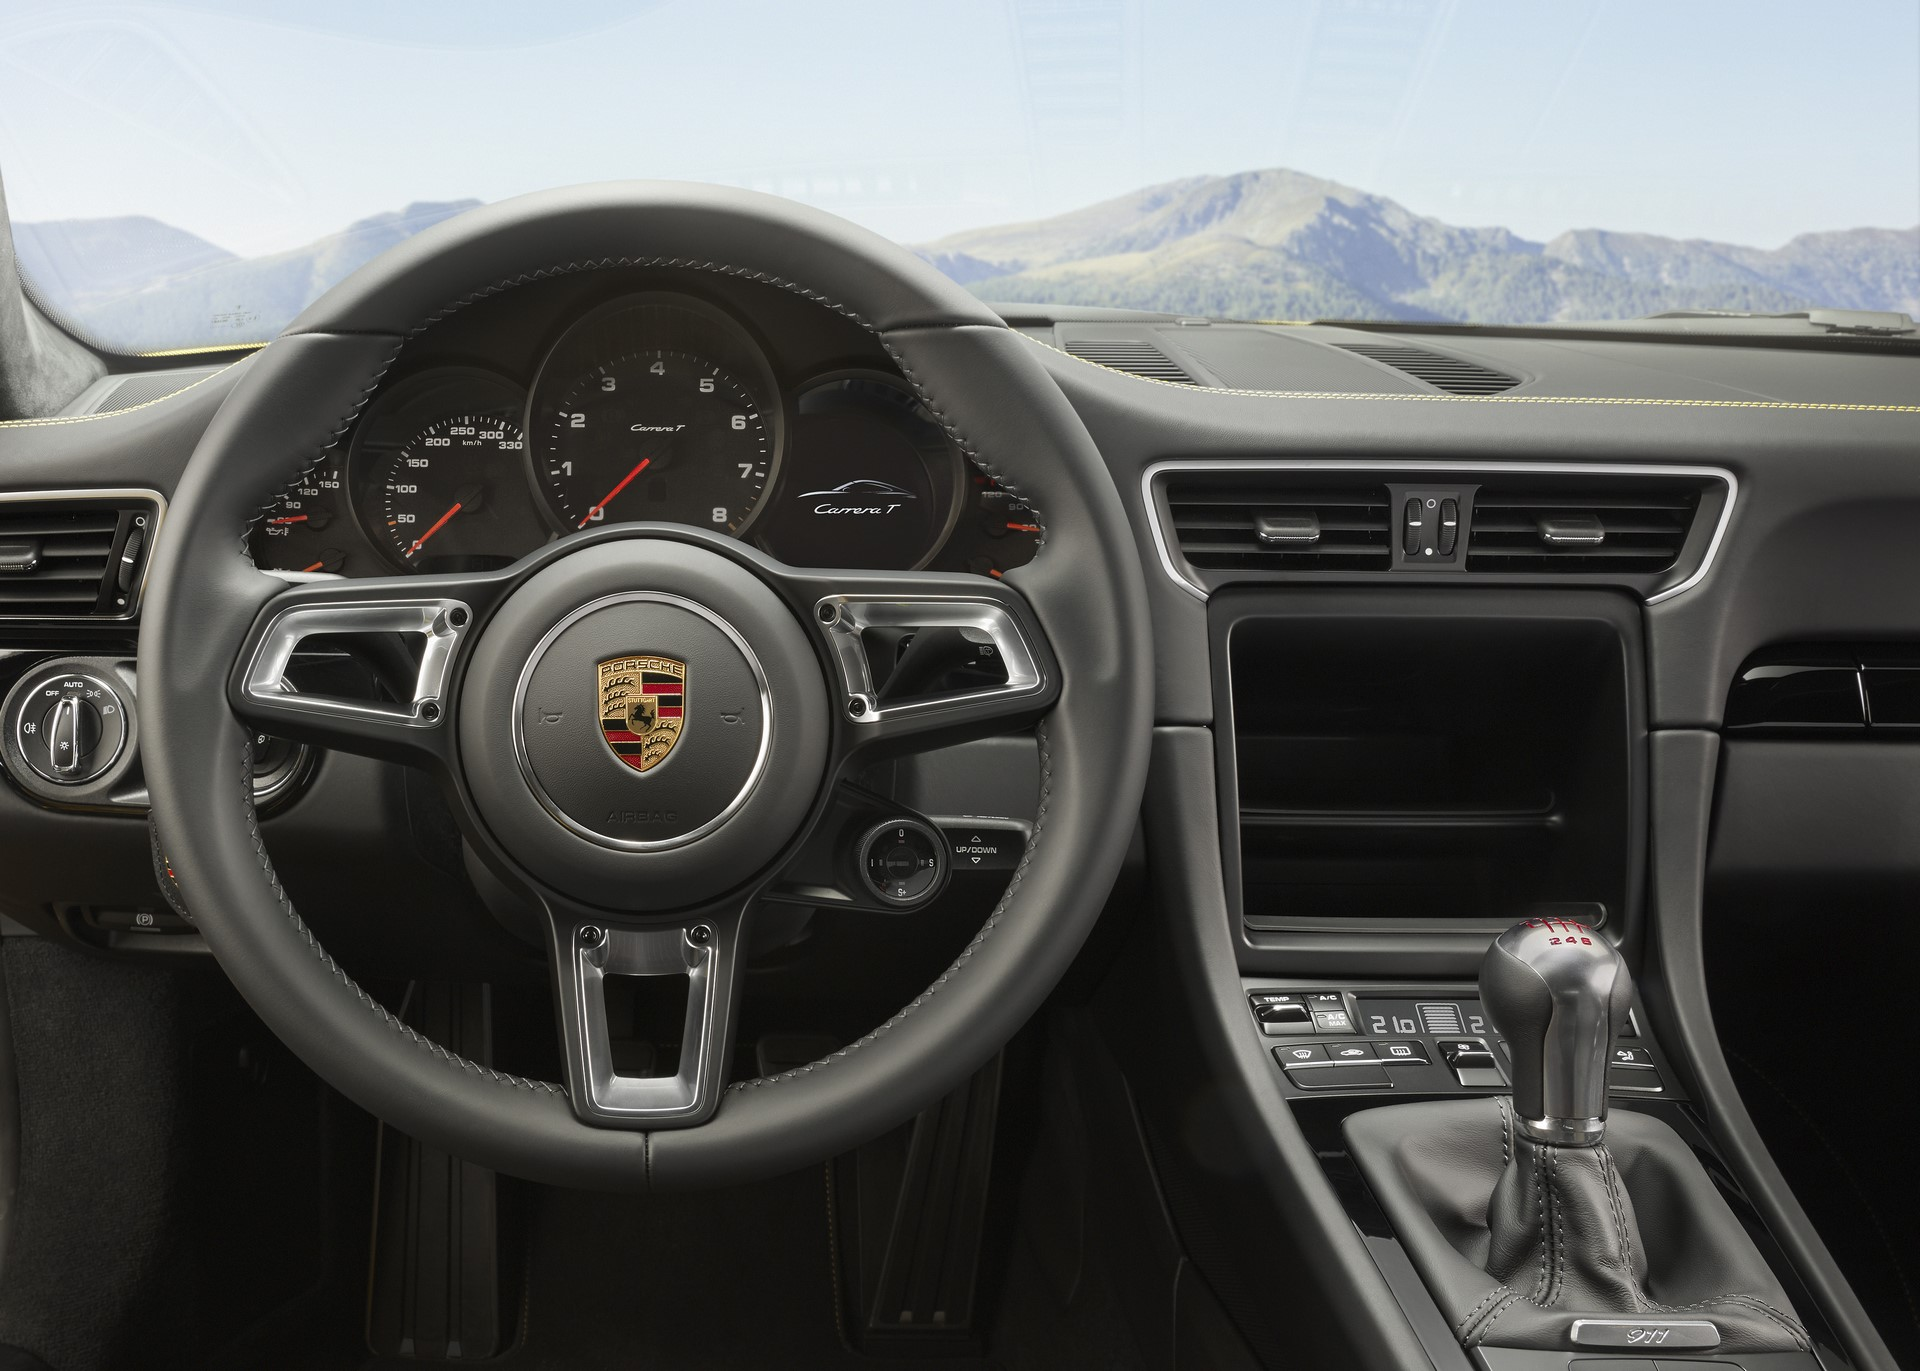 Porsche 911 Carrera T 2018 (9)